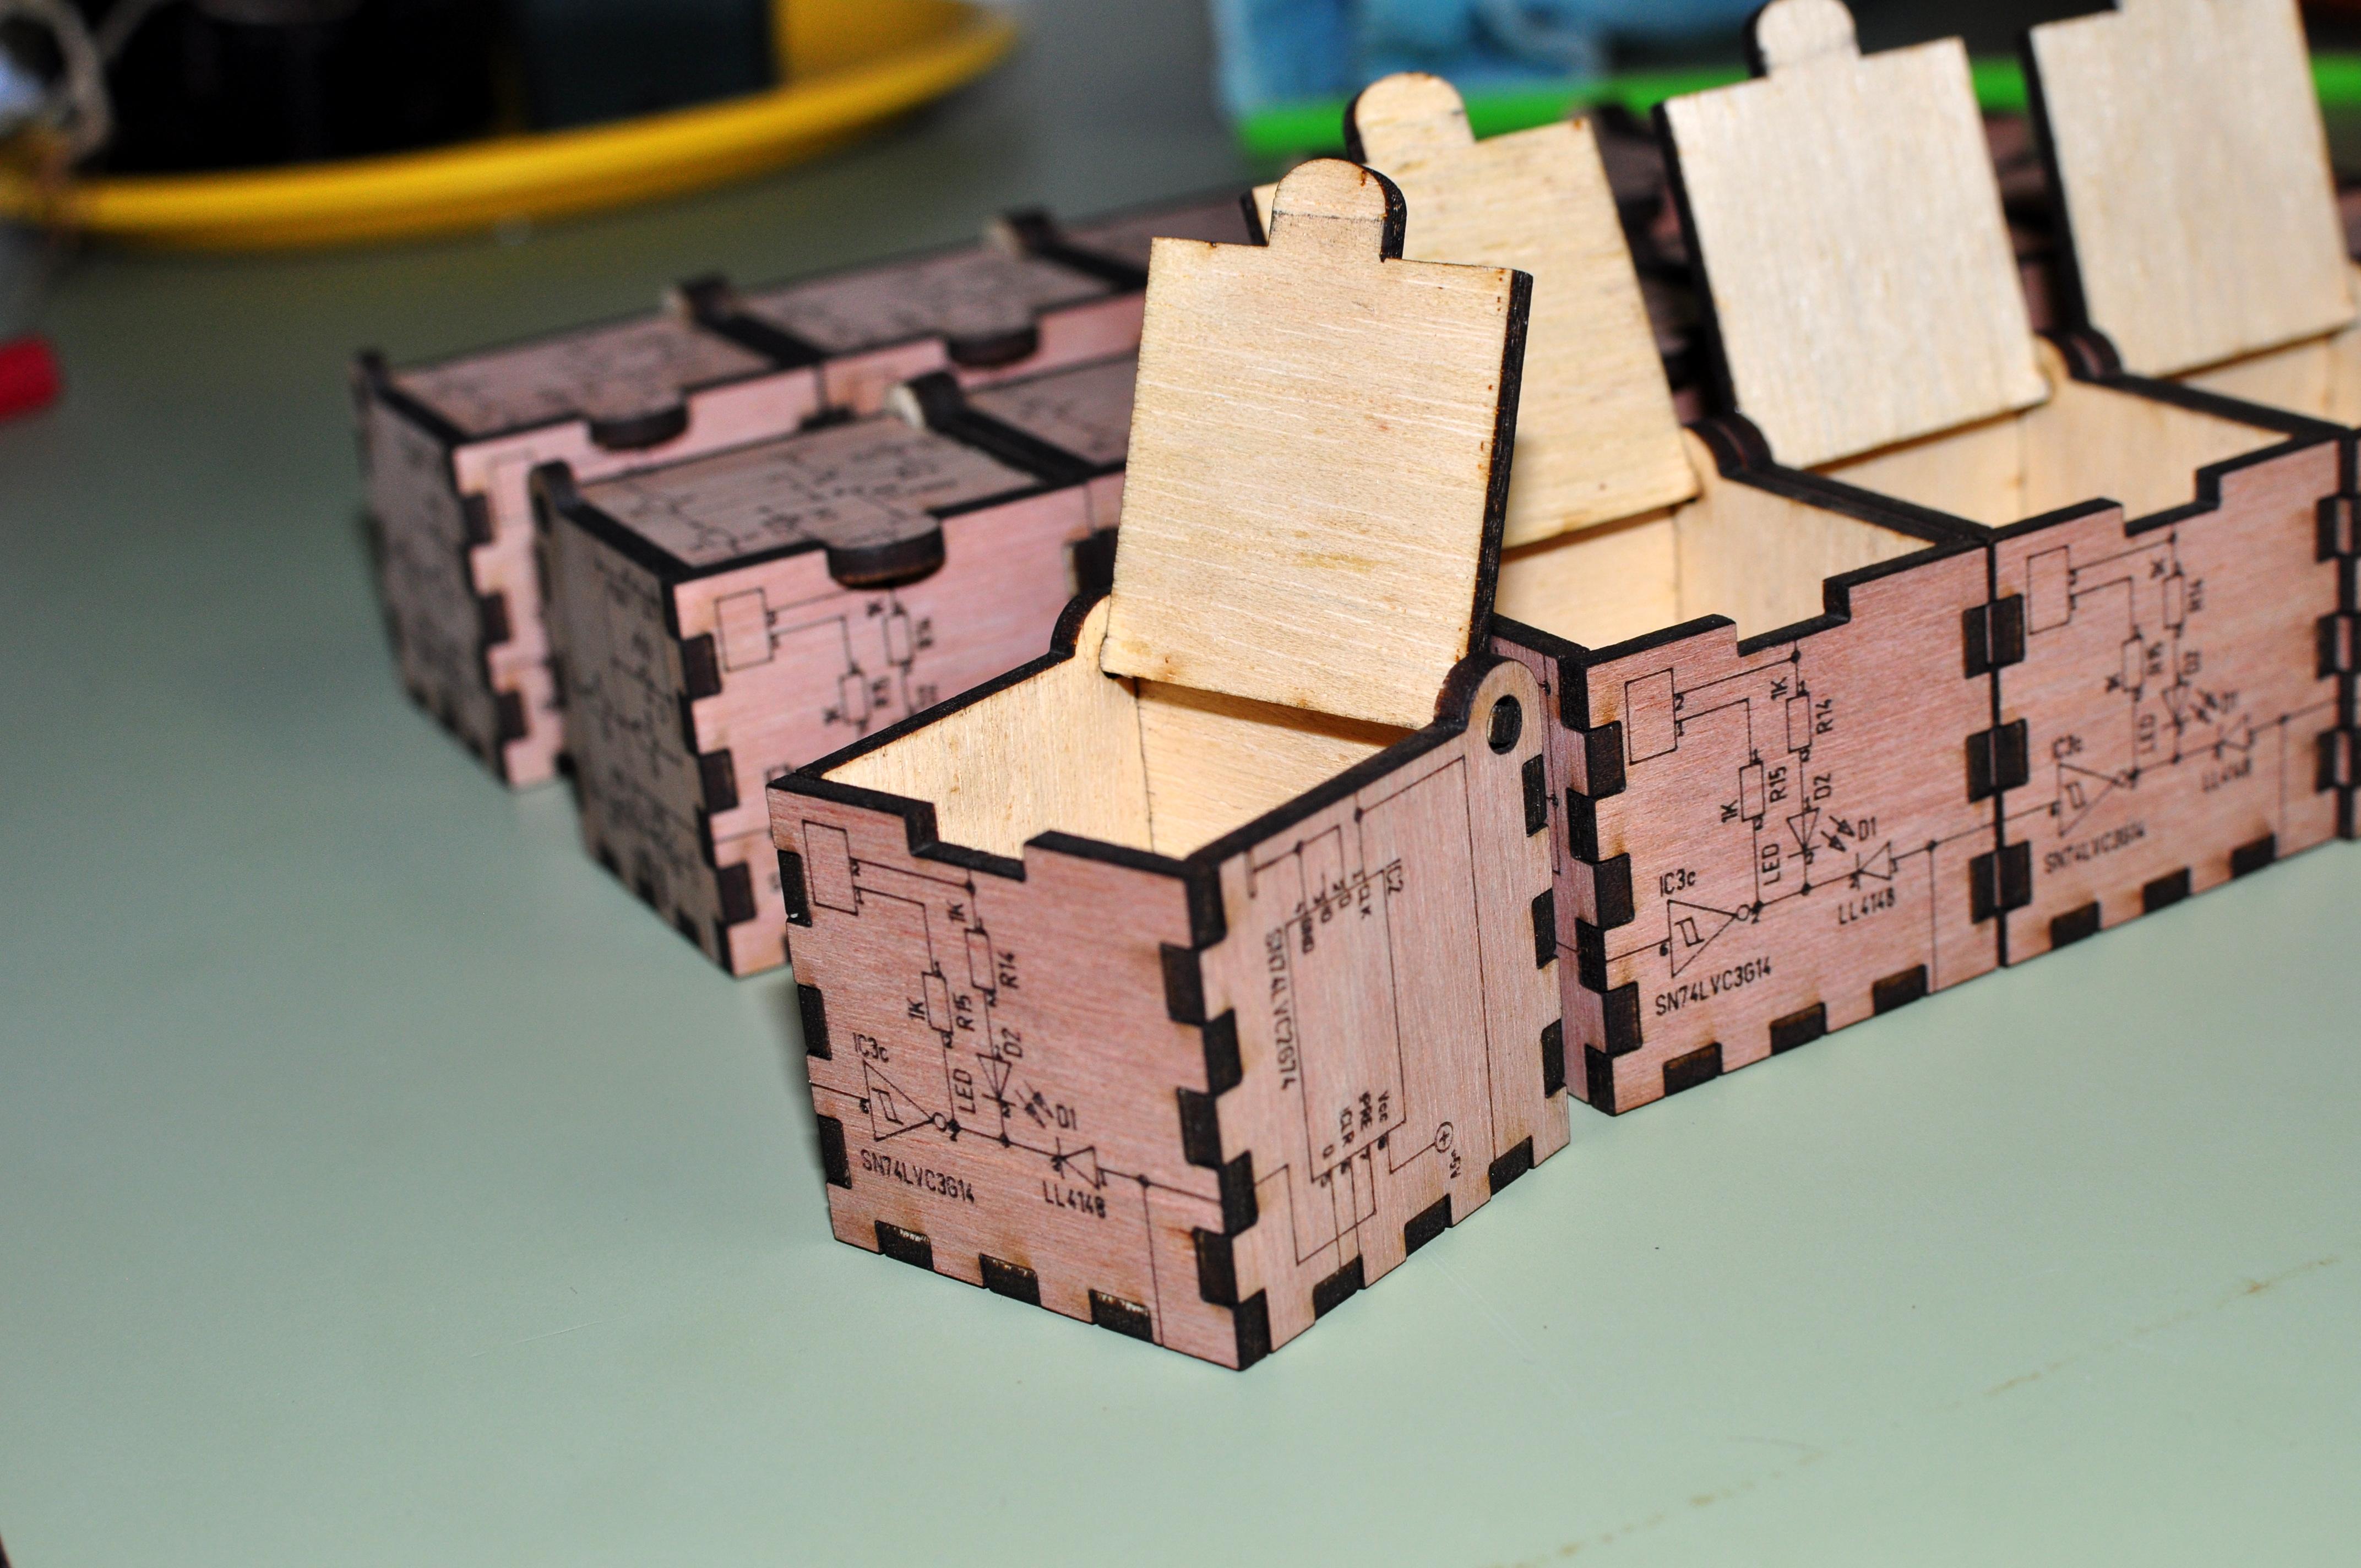 Laser Cut Wood Box With Schematic Diagram Design By Easybotics Dec 21 2017 View Original